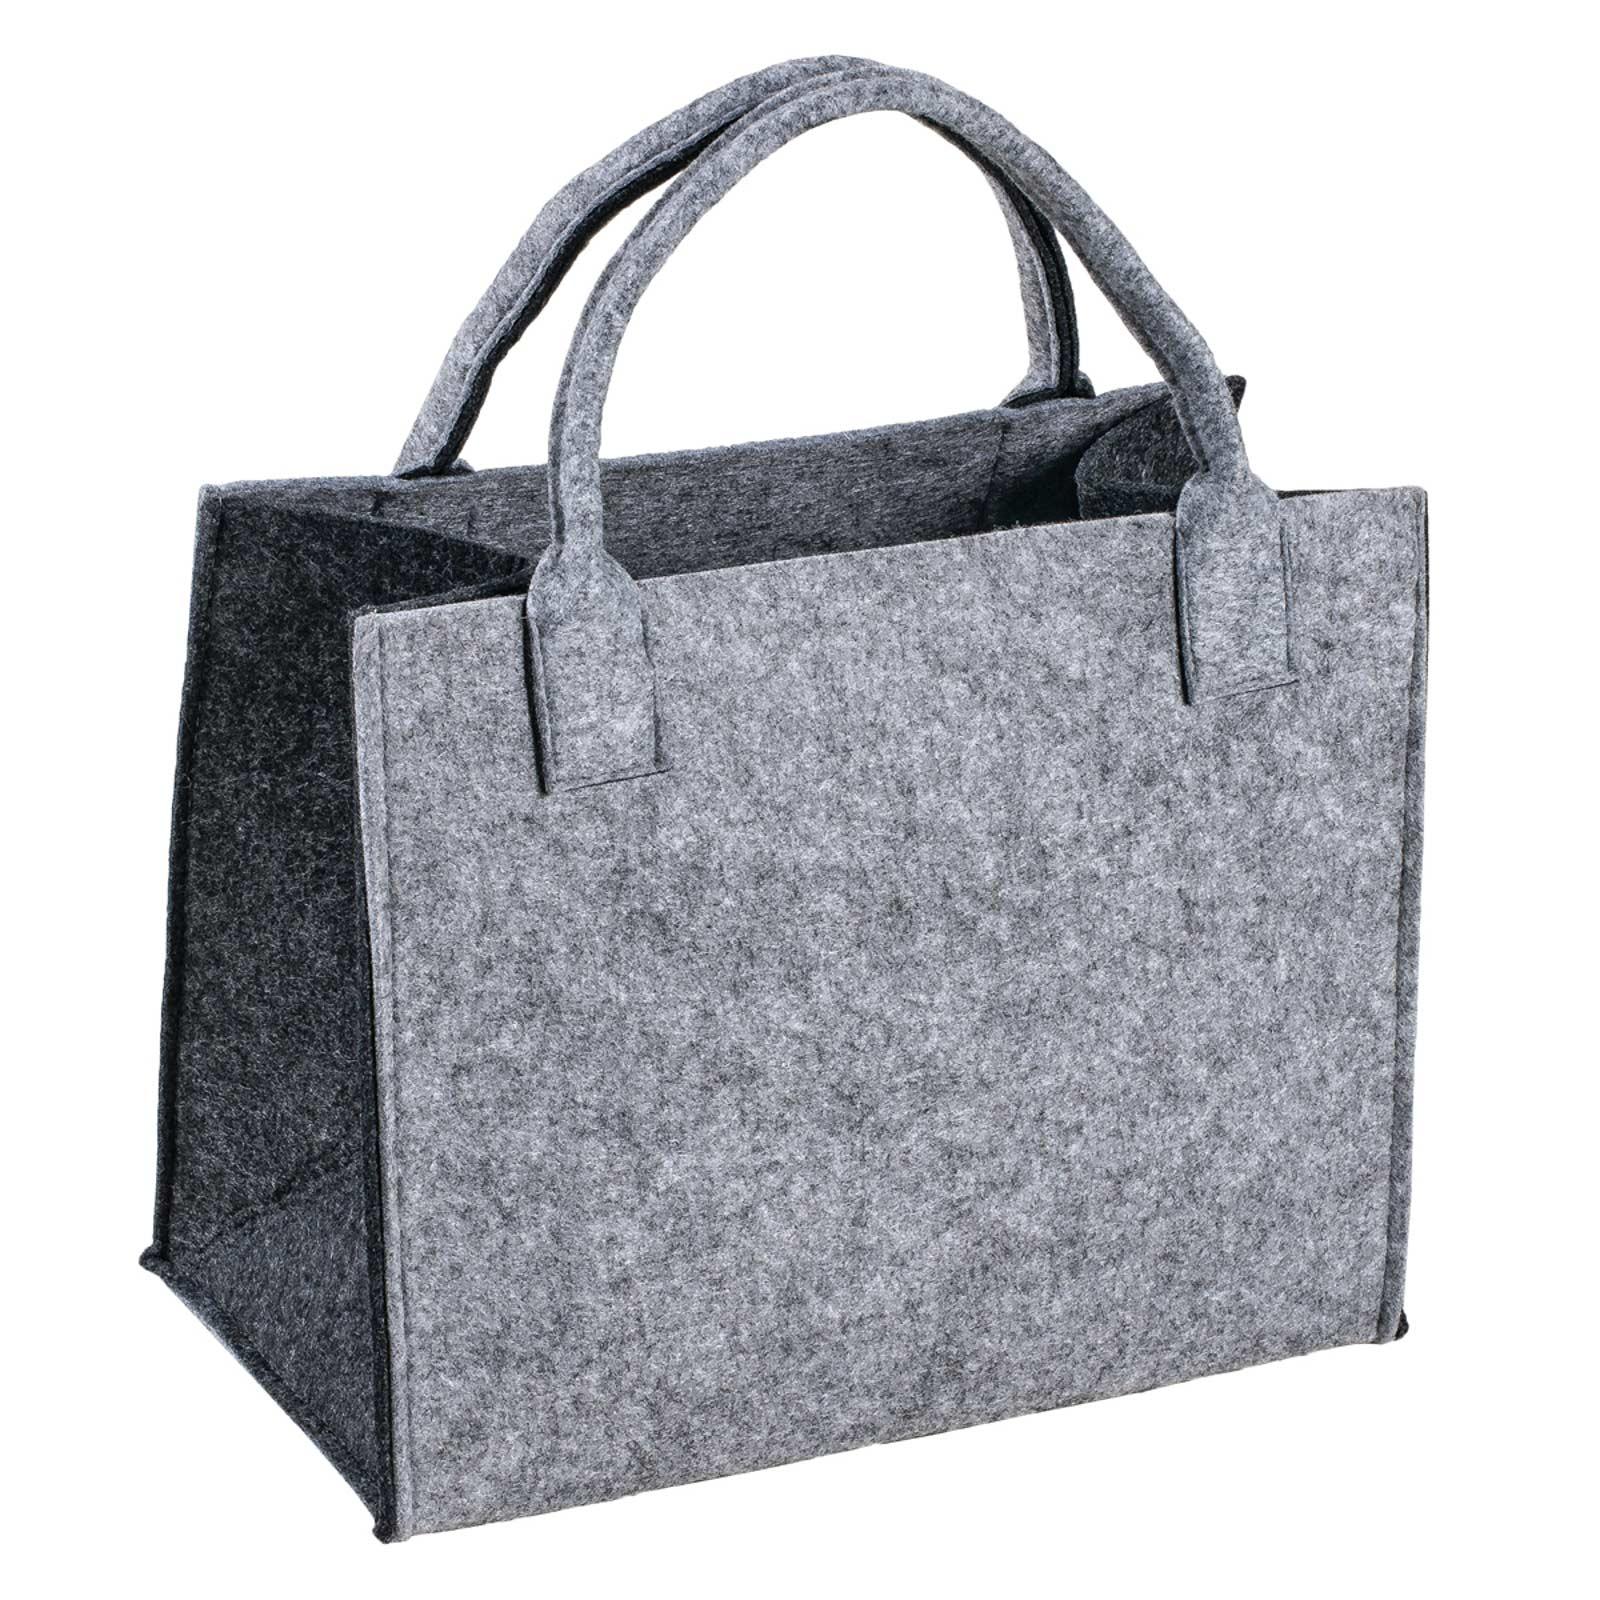 Filztasche, 35x20x43cm, zum gleich Benutzen oder Aufhübschen, 5mm Materialstärke – Bild 3